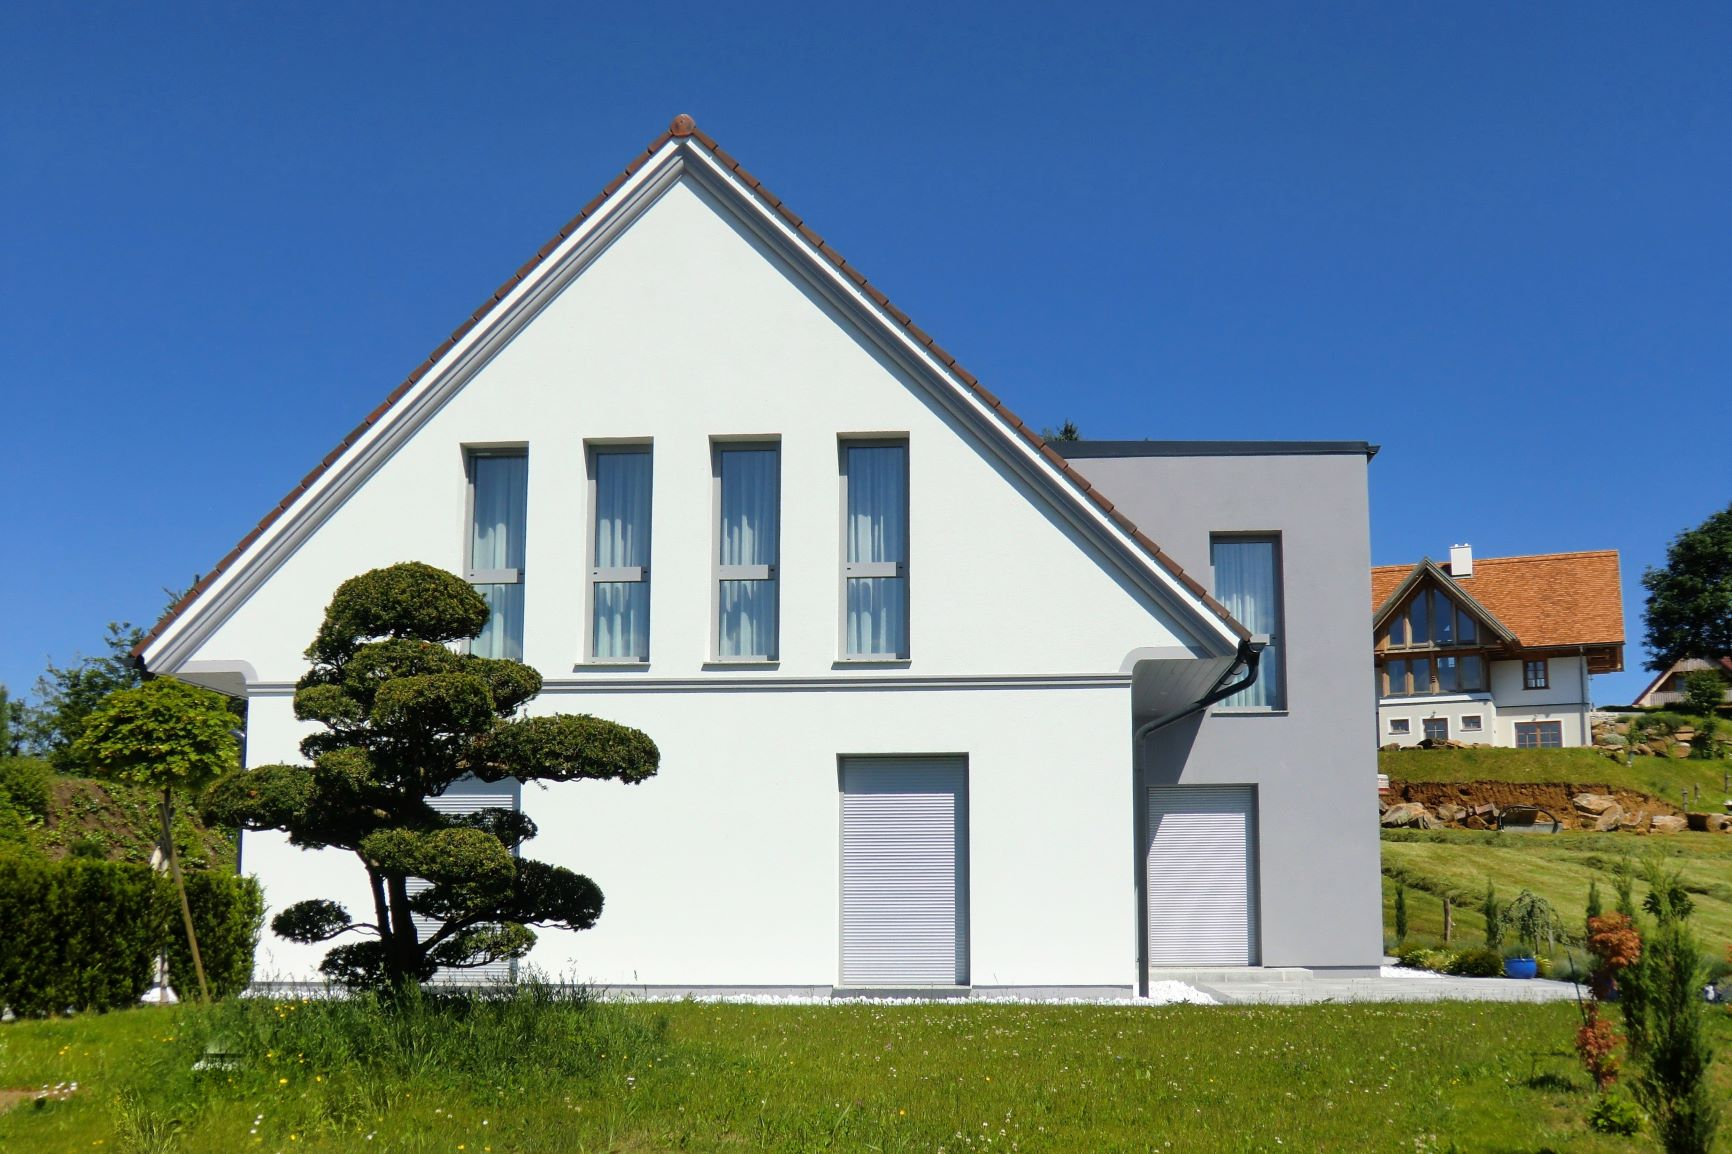 Kiegerl Baufirma - Sattteldach Haus